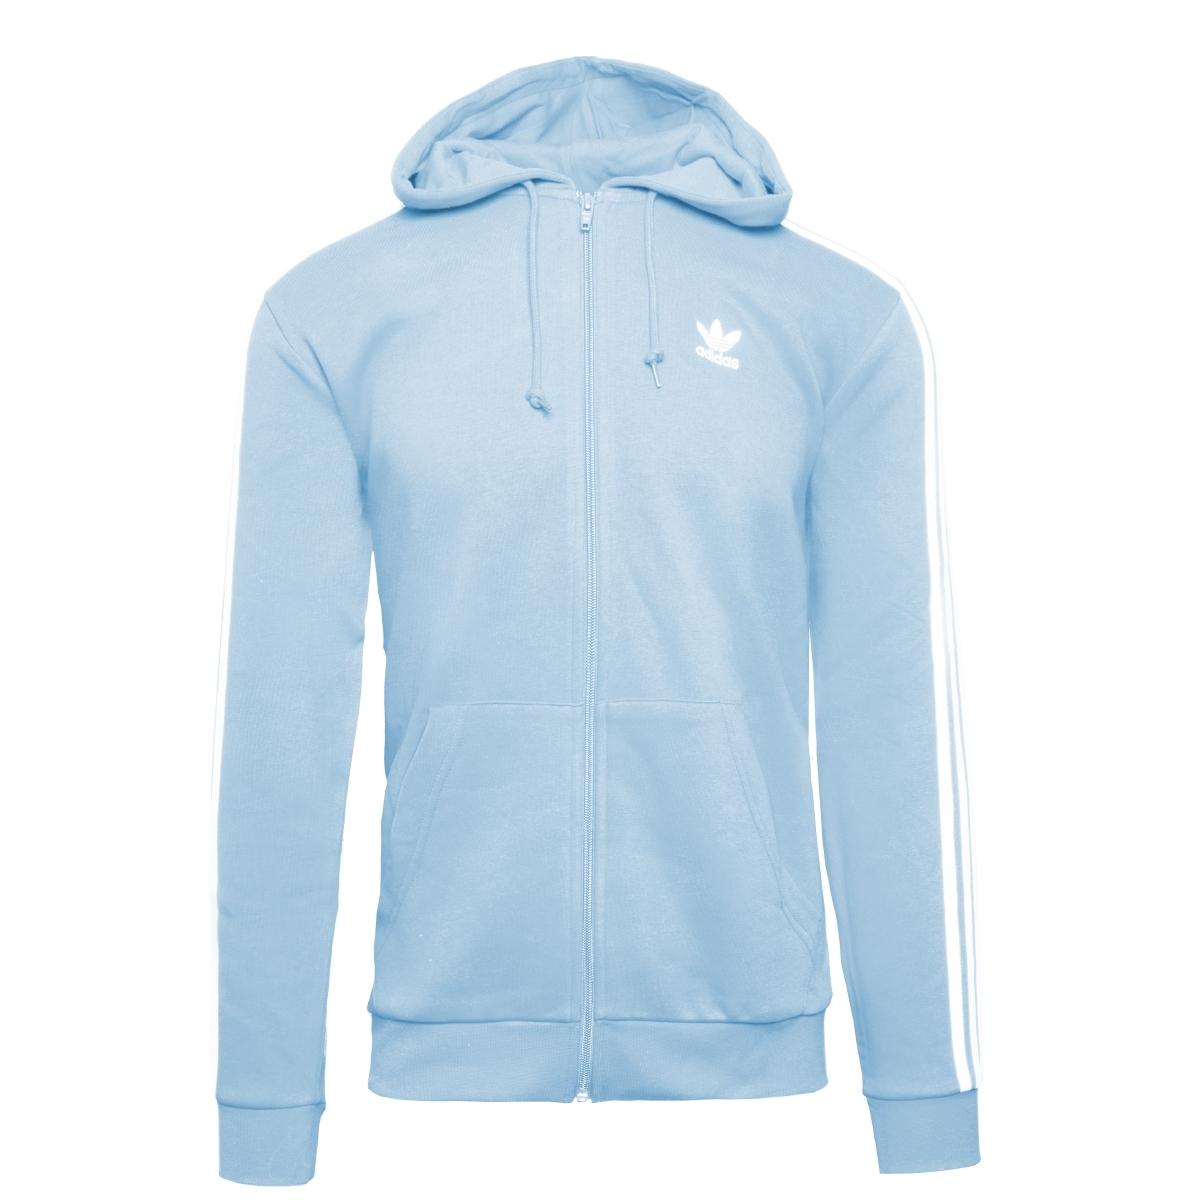 Adidas 3 Stripes Full Zip Hoodie Herren Kapuzen Jacke